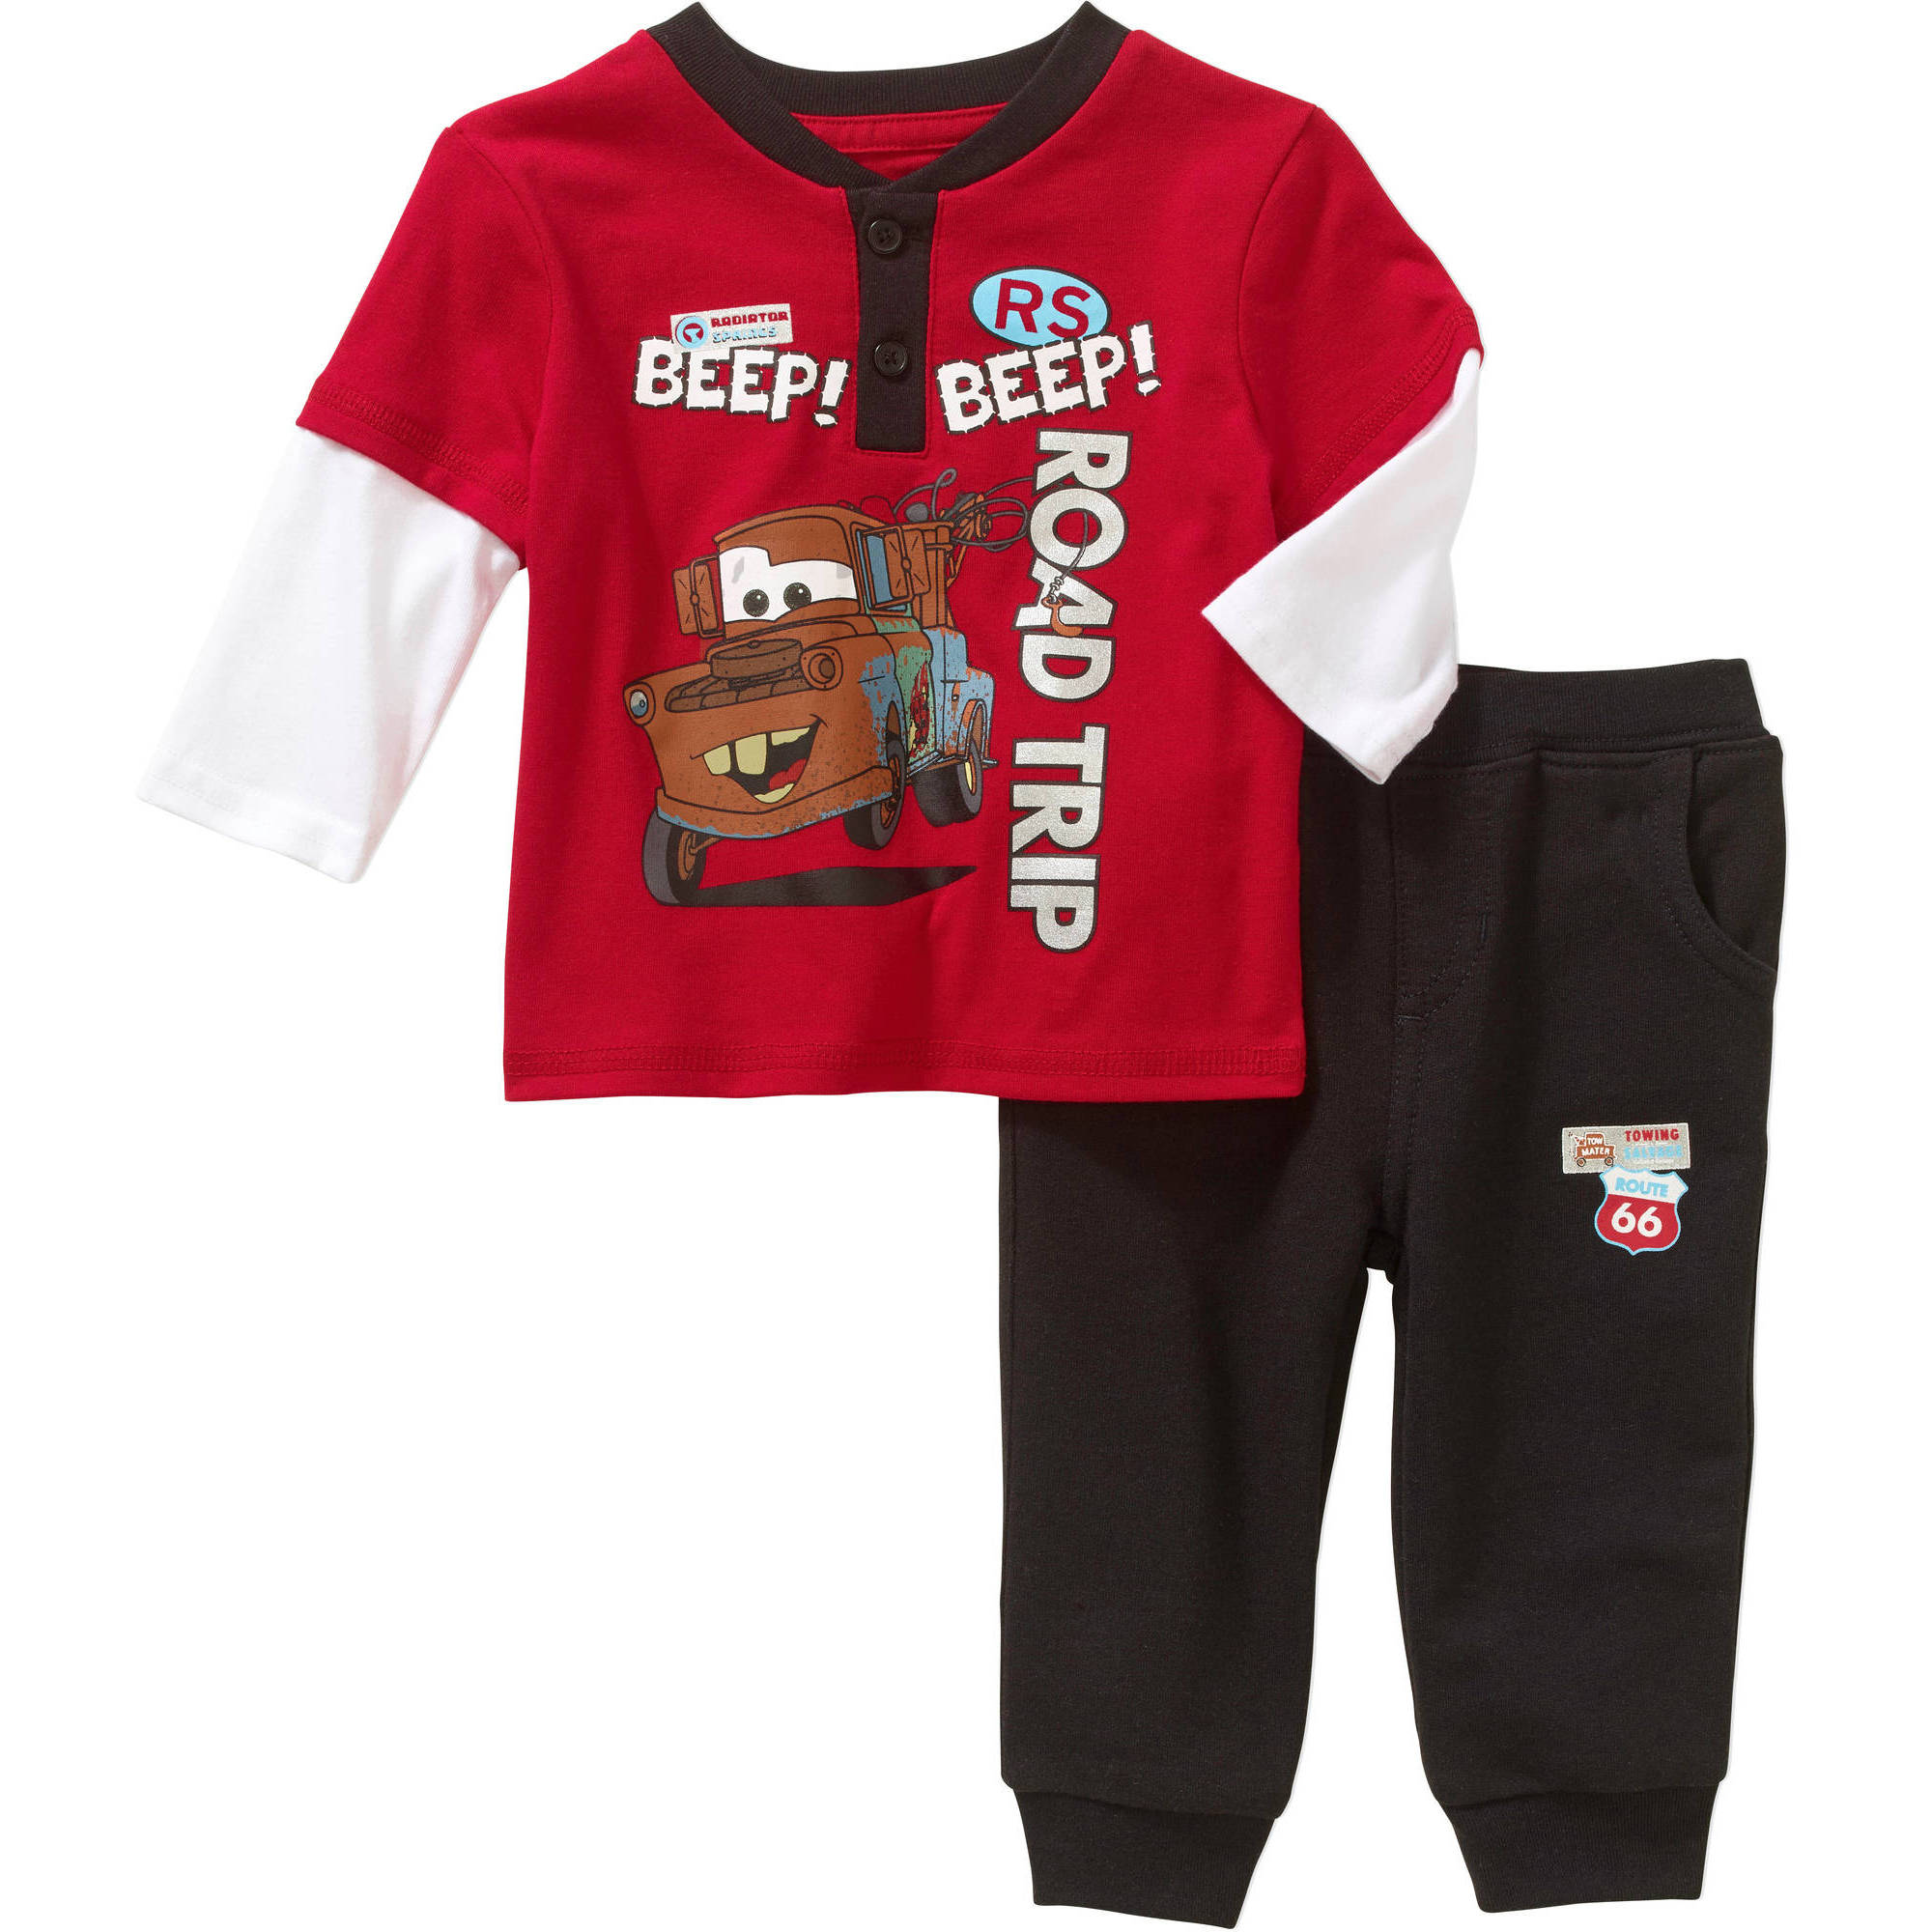 Cars Newborn Baby Boy Long Sleeve Tee and Pant Set